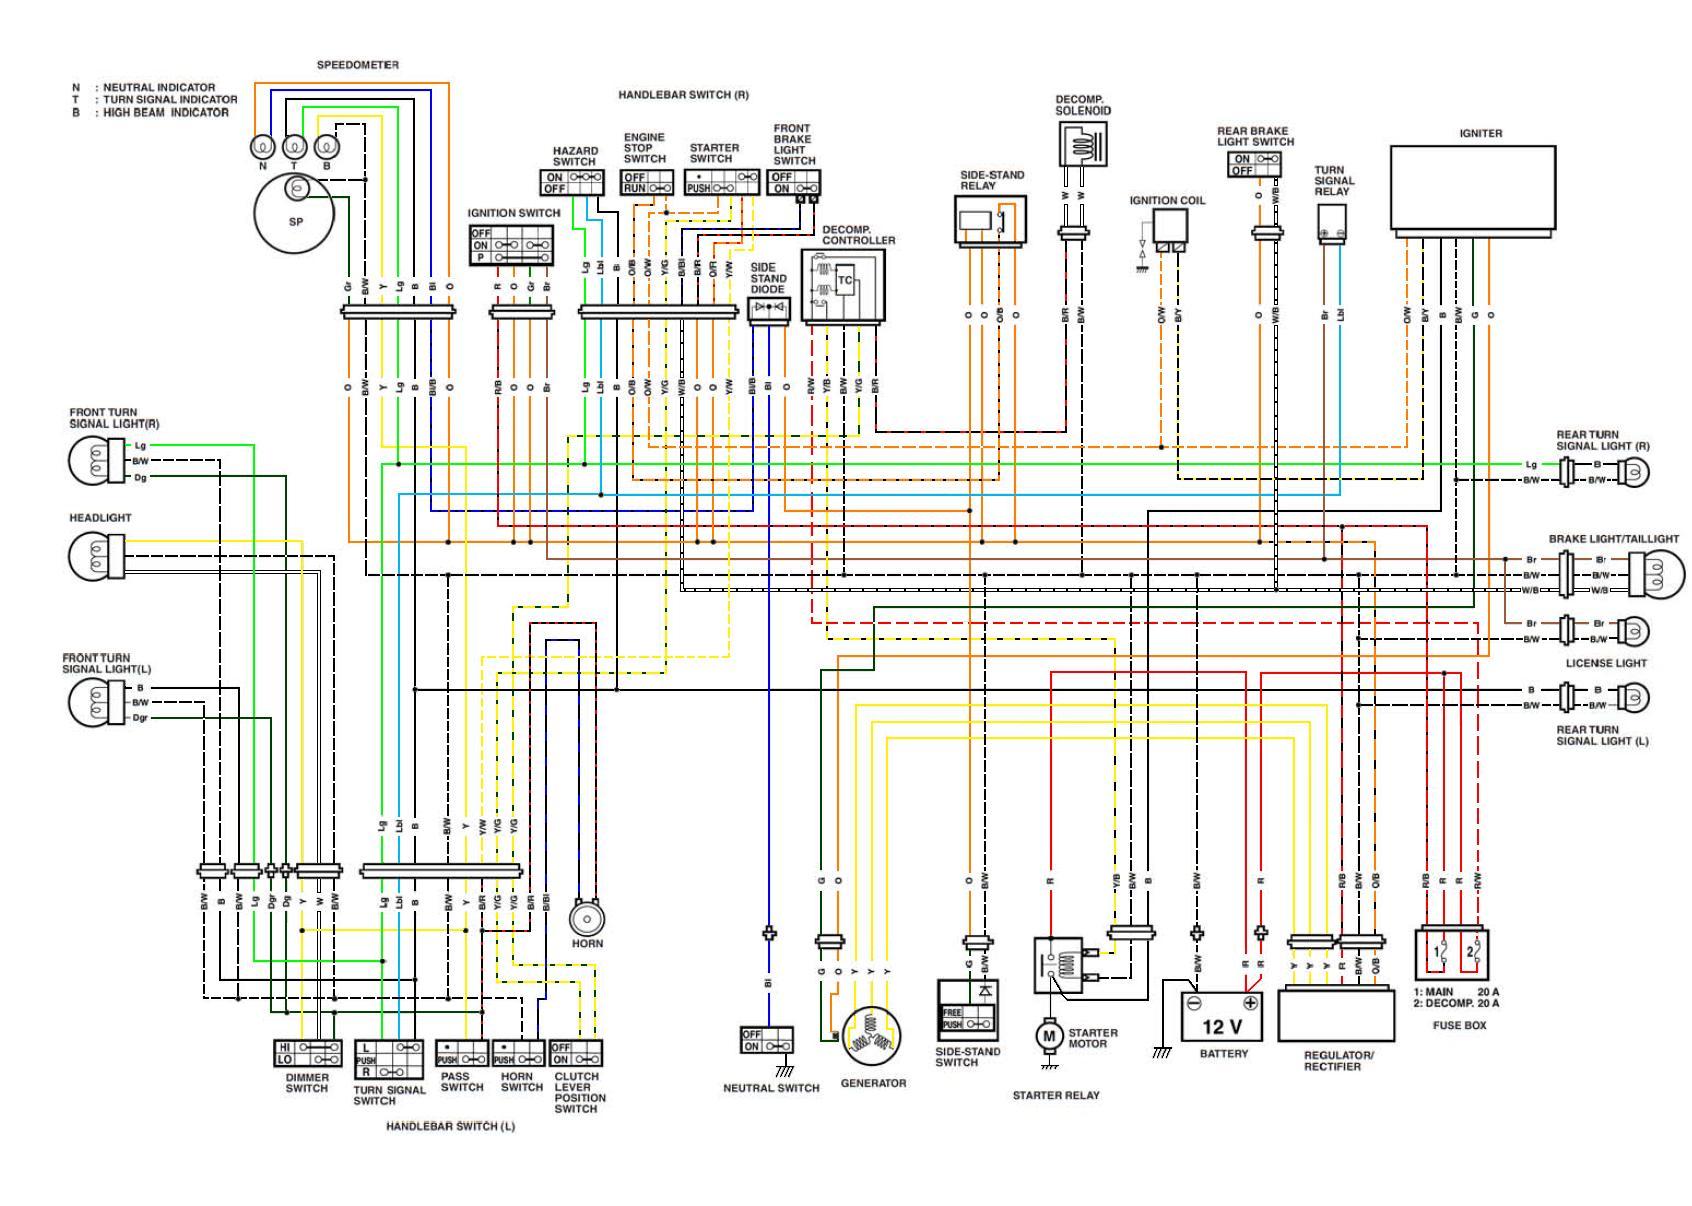 hight resolution of suzuki savage 650 fuse box wiring diagram h8suzuki savage 650 fuse box wiring library suzuki savage